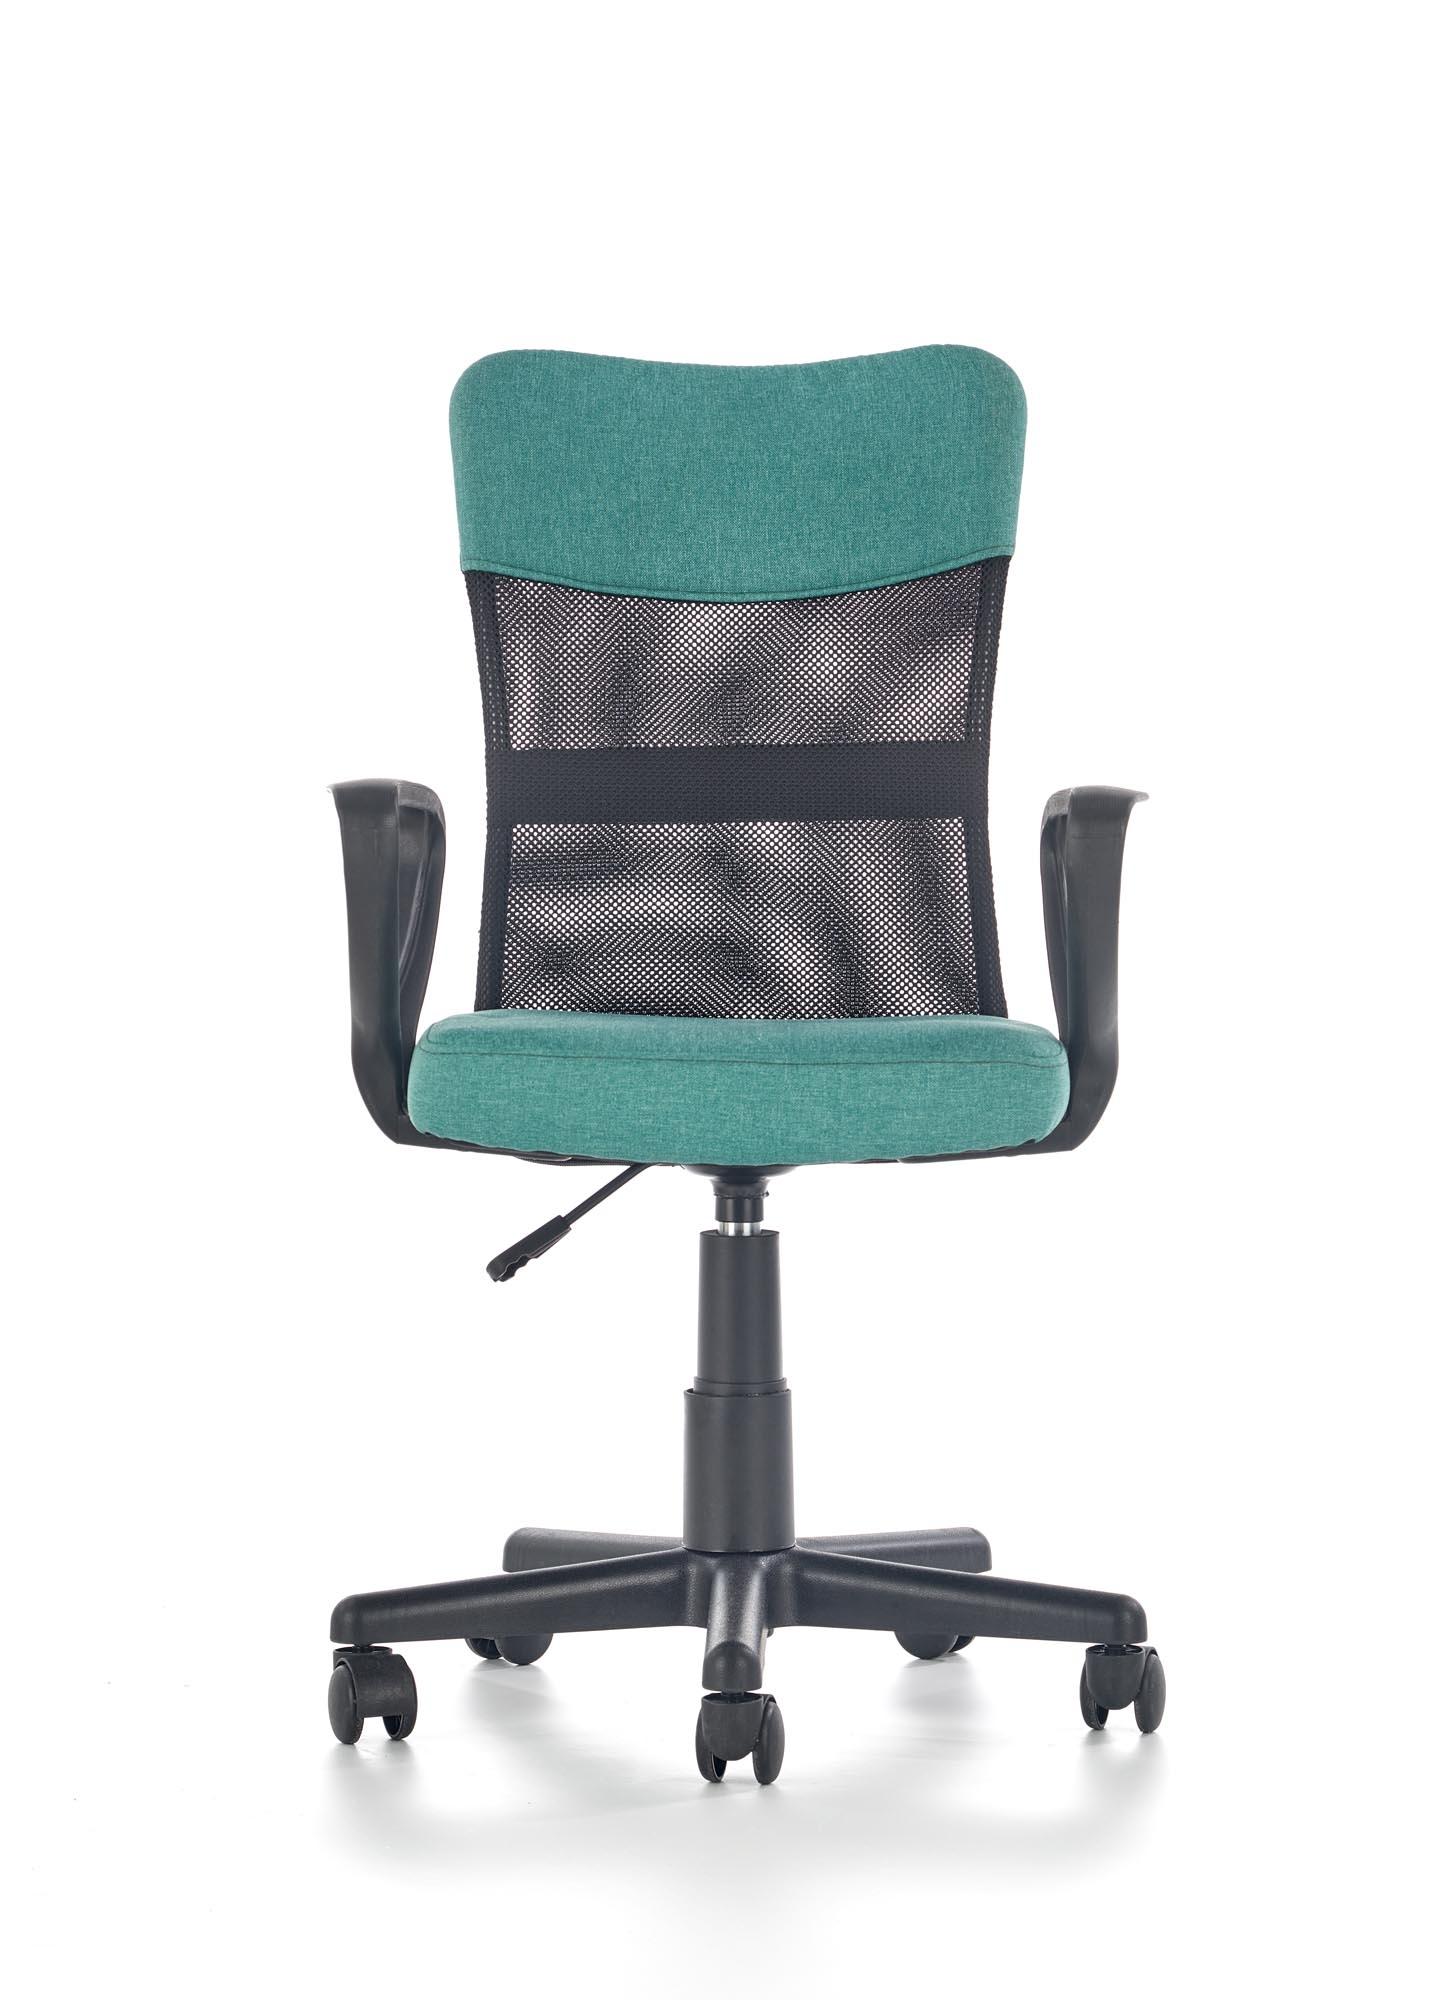 Scaun de birou pentru copii Timmy Turquoise / Black, l52xA59xH81-91 cm imagine